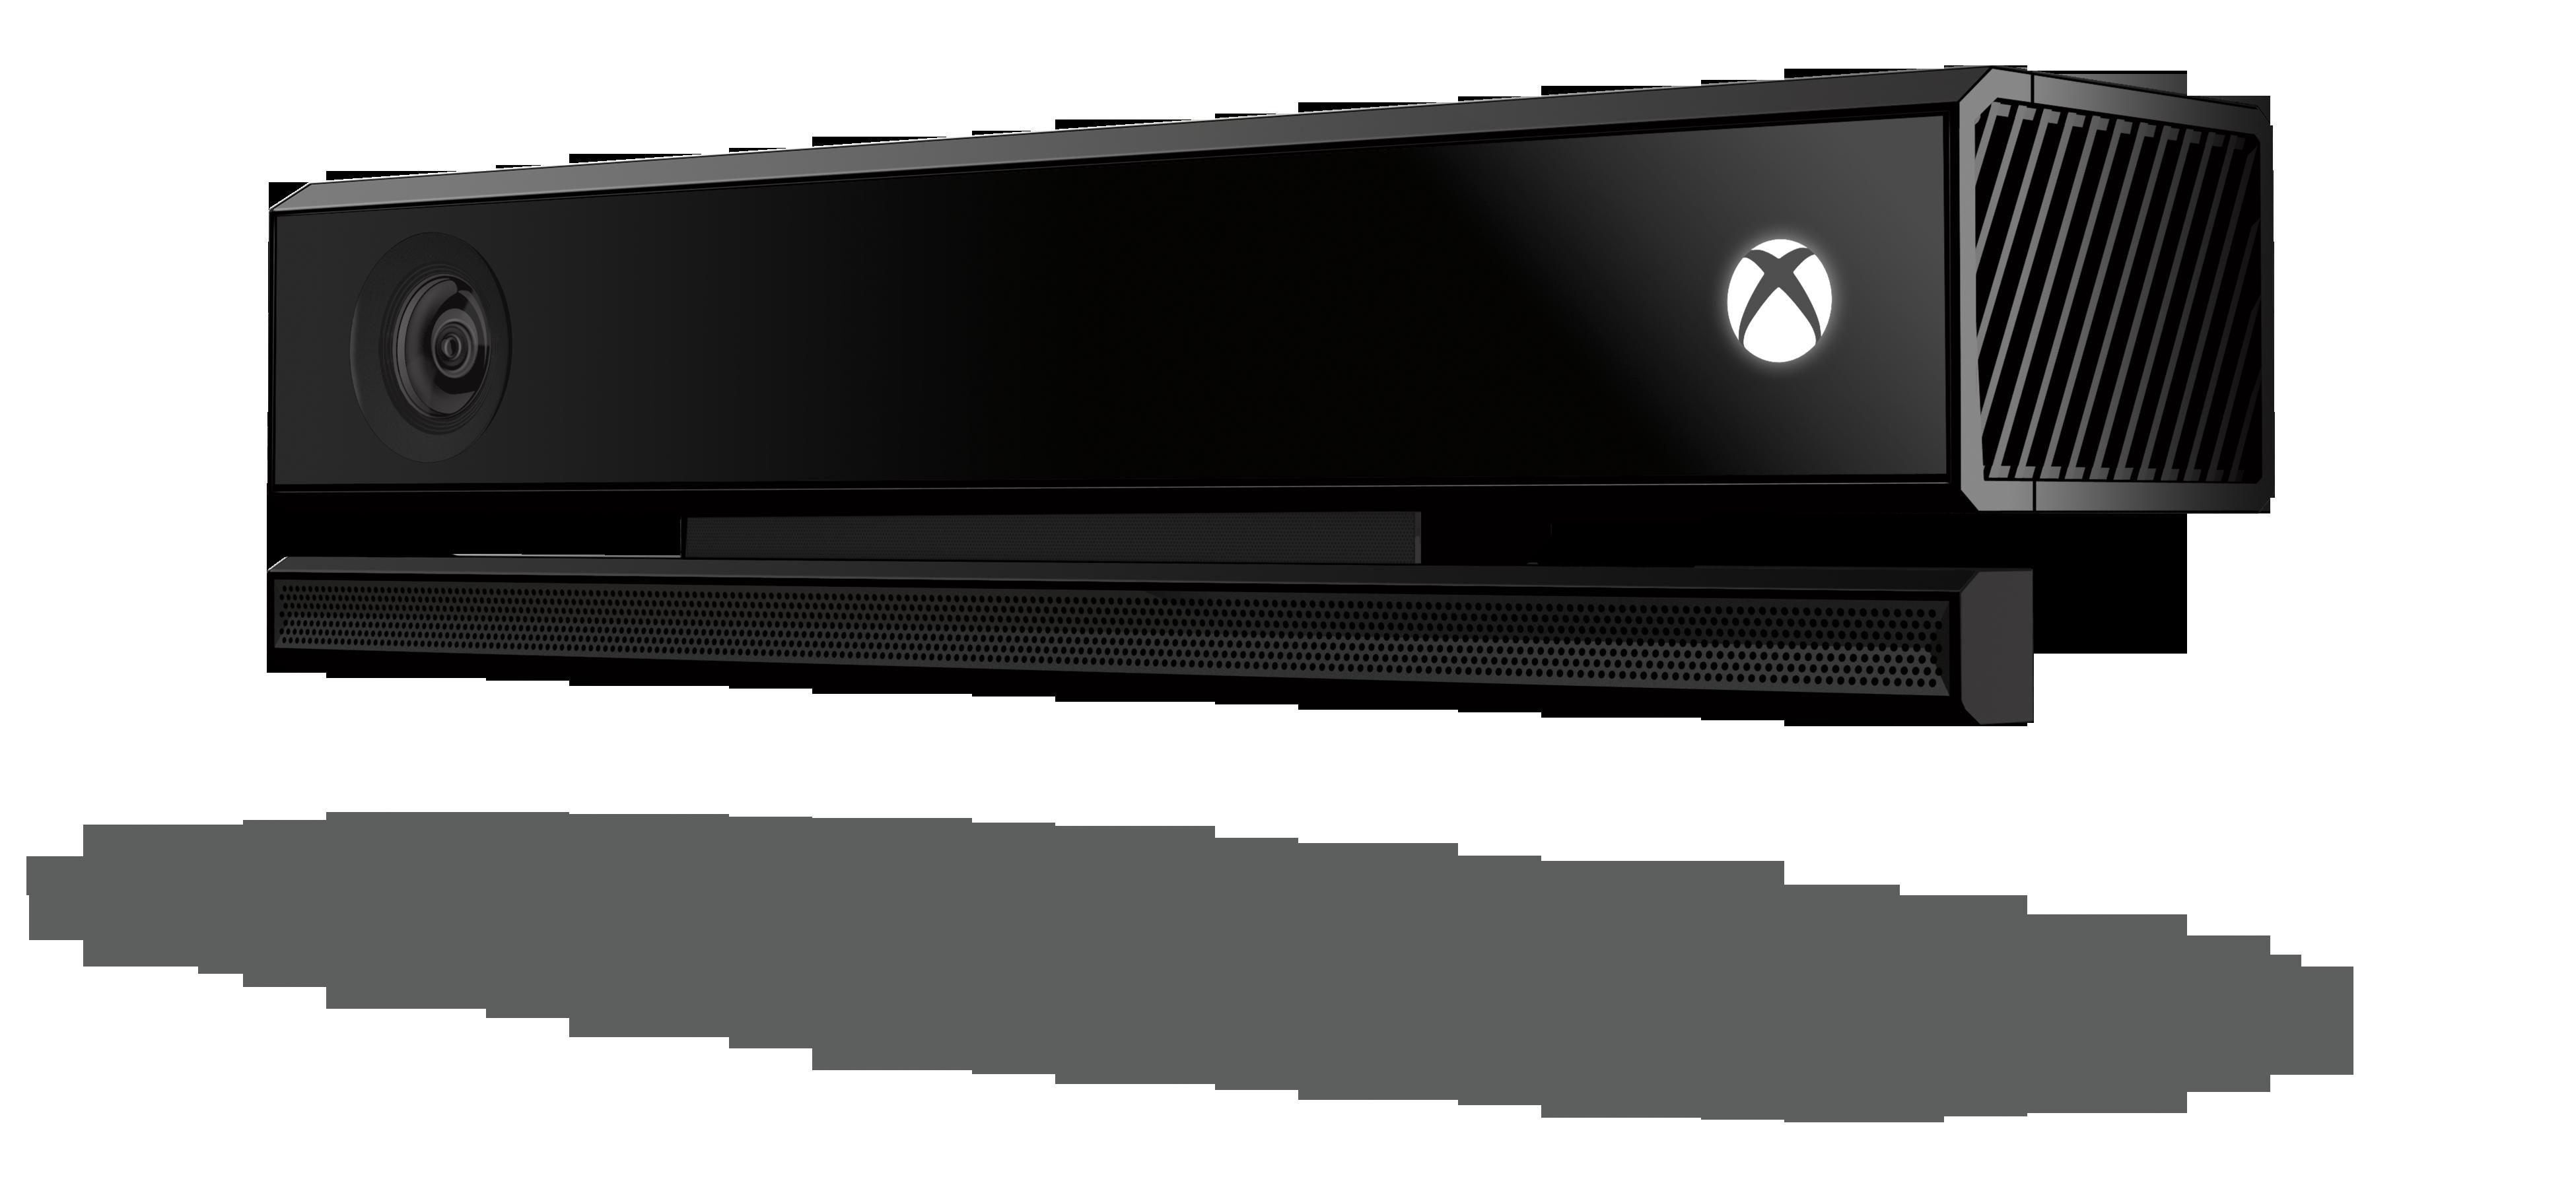 XBOX ONE - Senzor Kinect v2